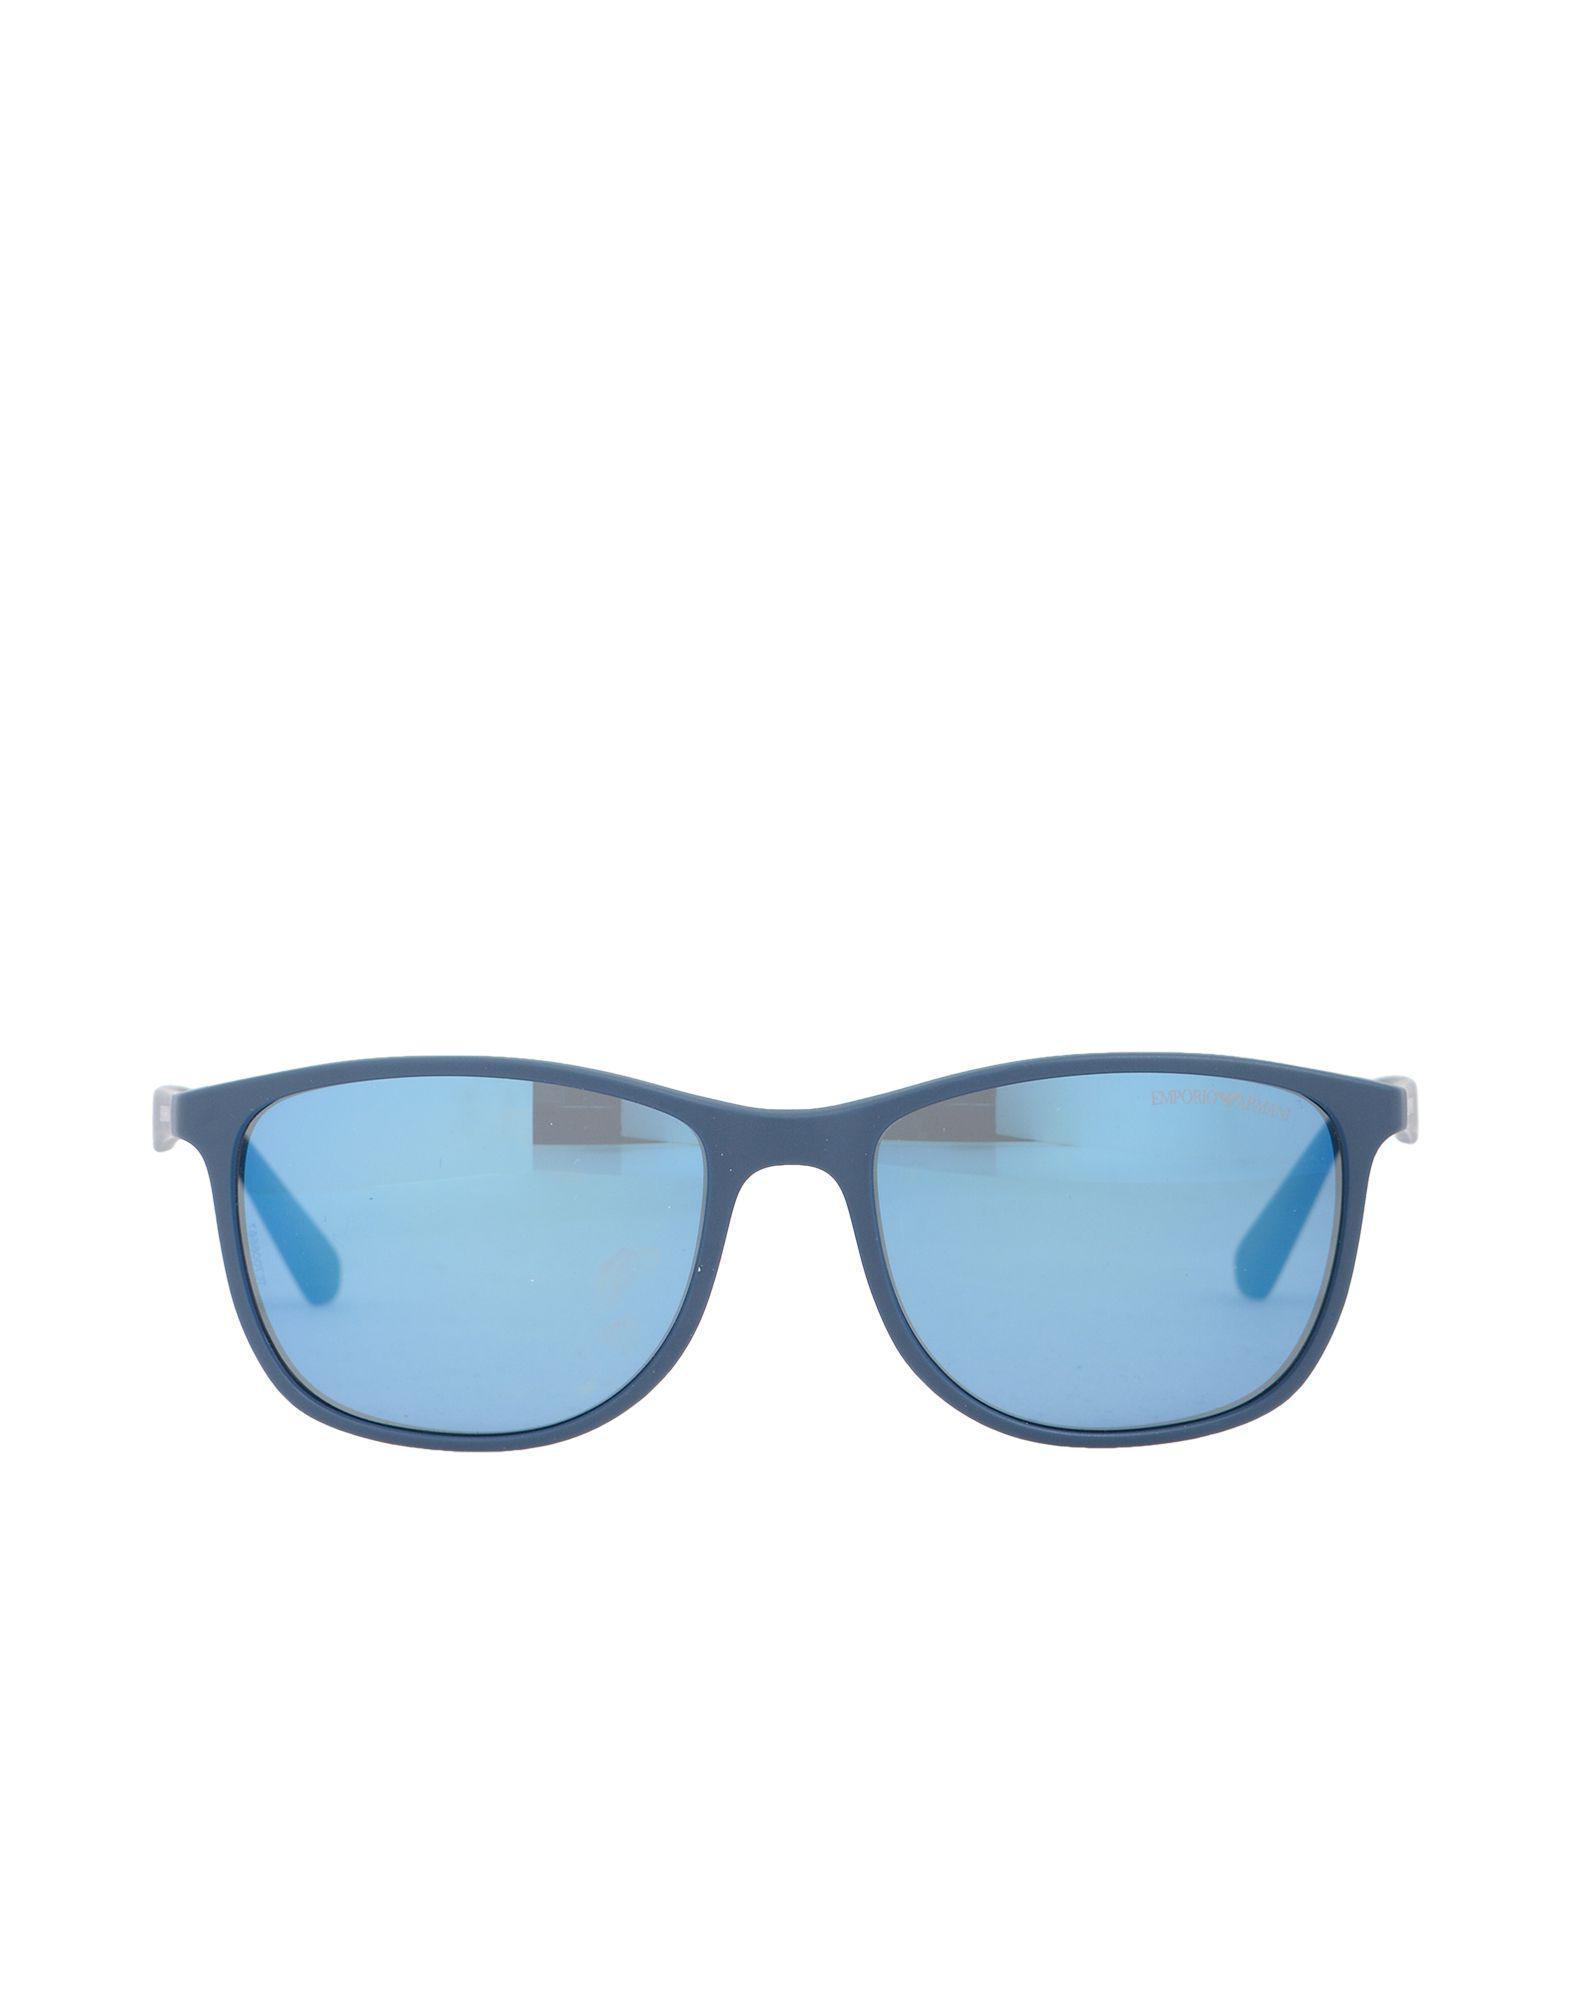 99a41b4bffc7 Emporio Armani Sunglasses in Blue for Men - Lyst